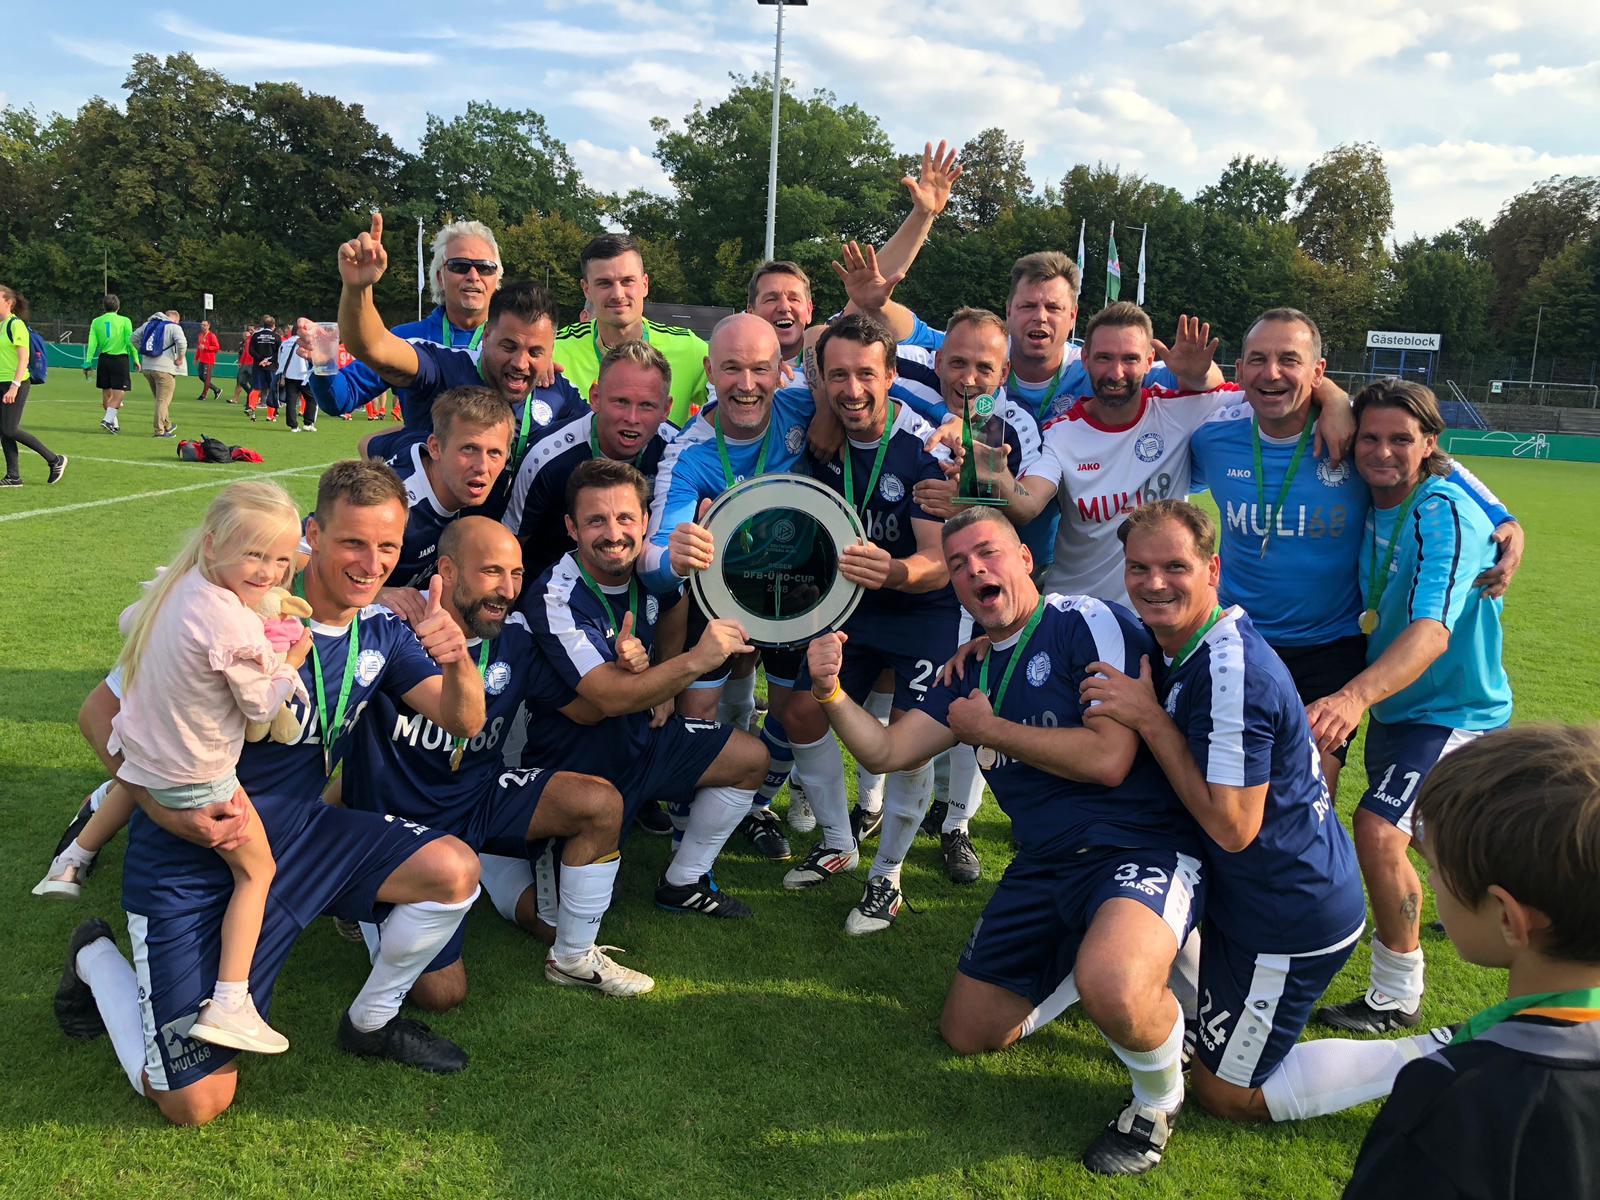 DFB Ü40-Cup in Berlin: Blau-Weiß 90 holt den Titel